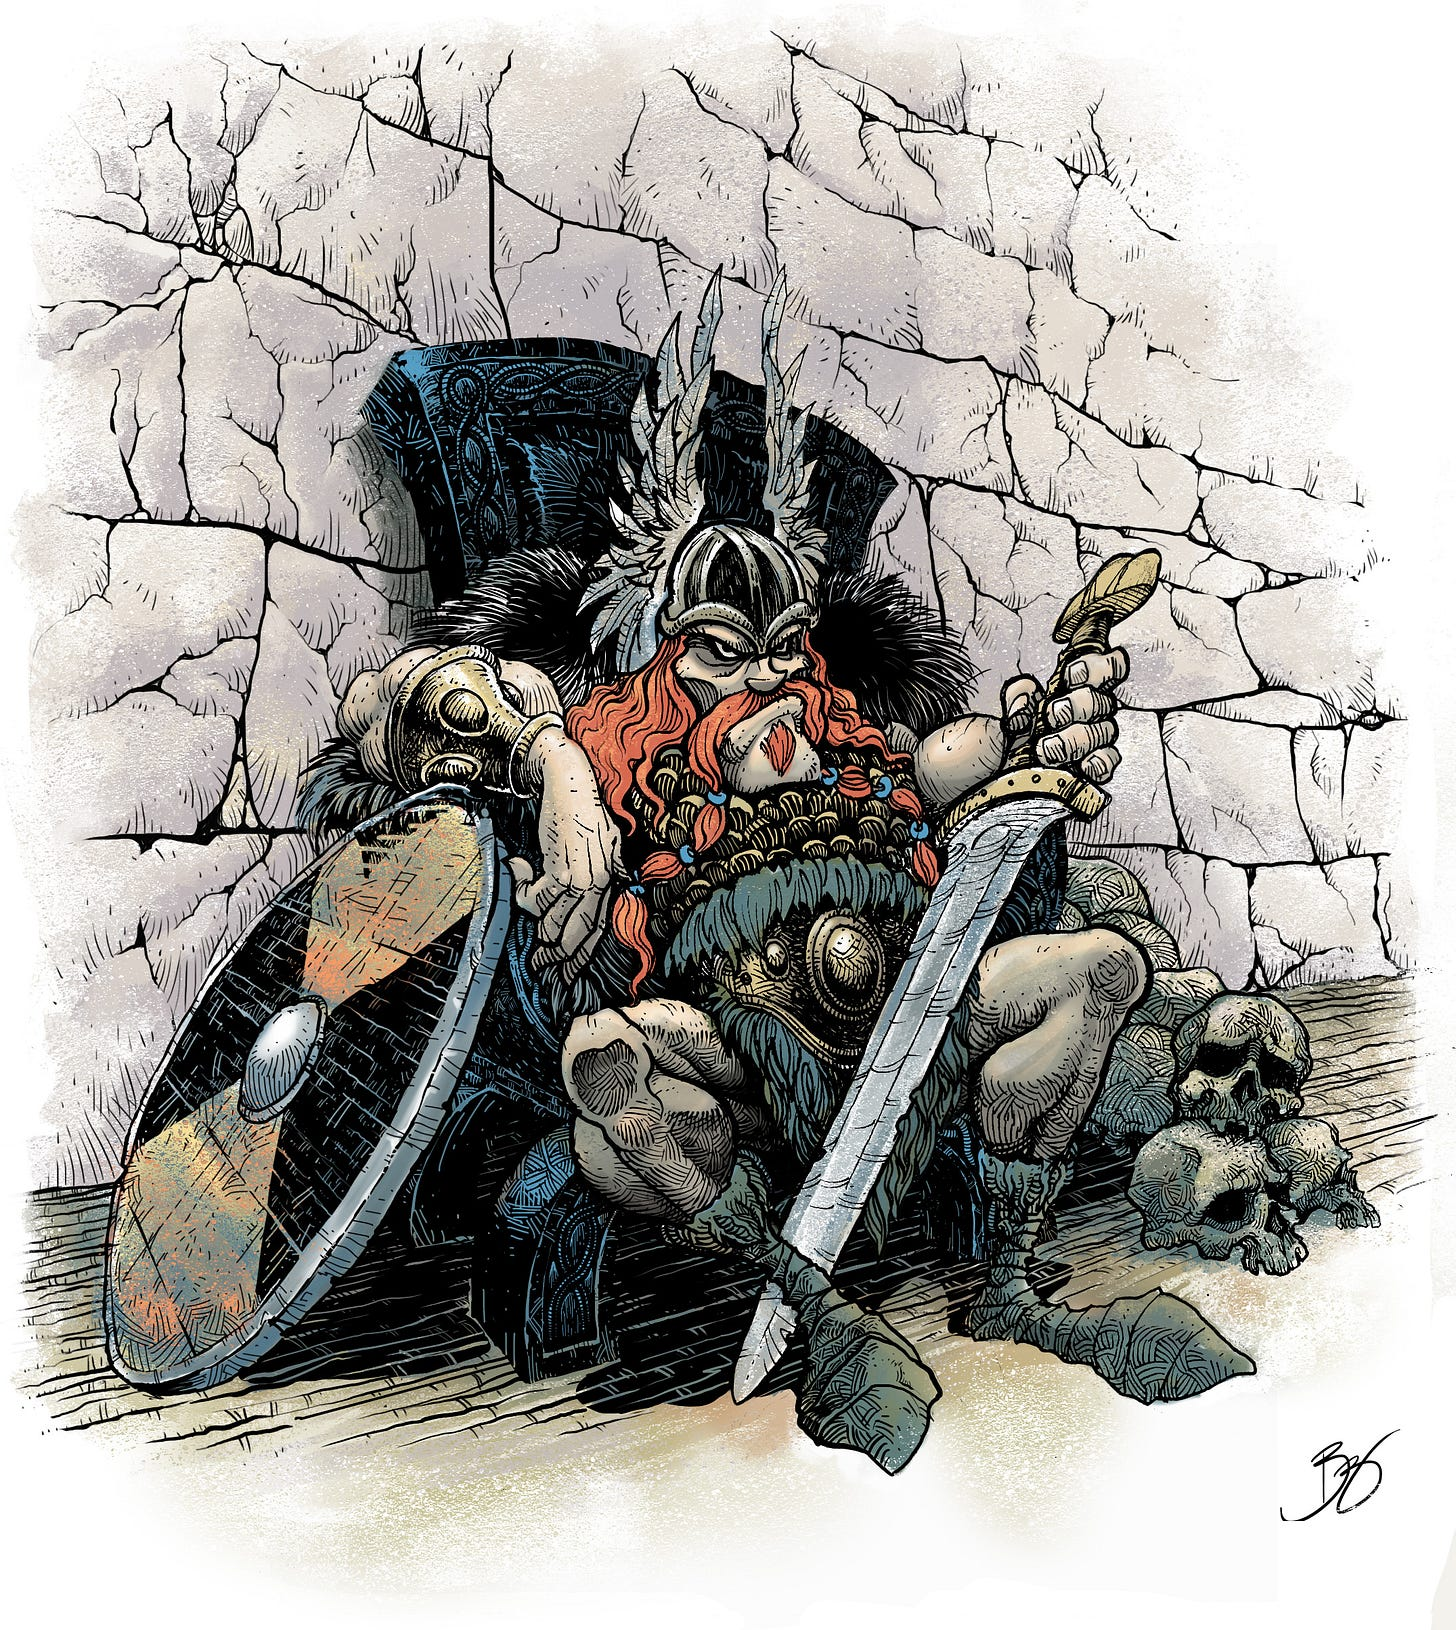 Viking Chieftain by BebetoDarOZ   Character Art   2D   CGSociety